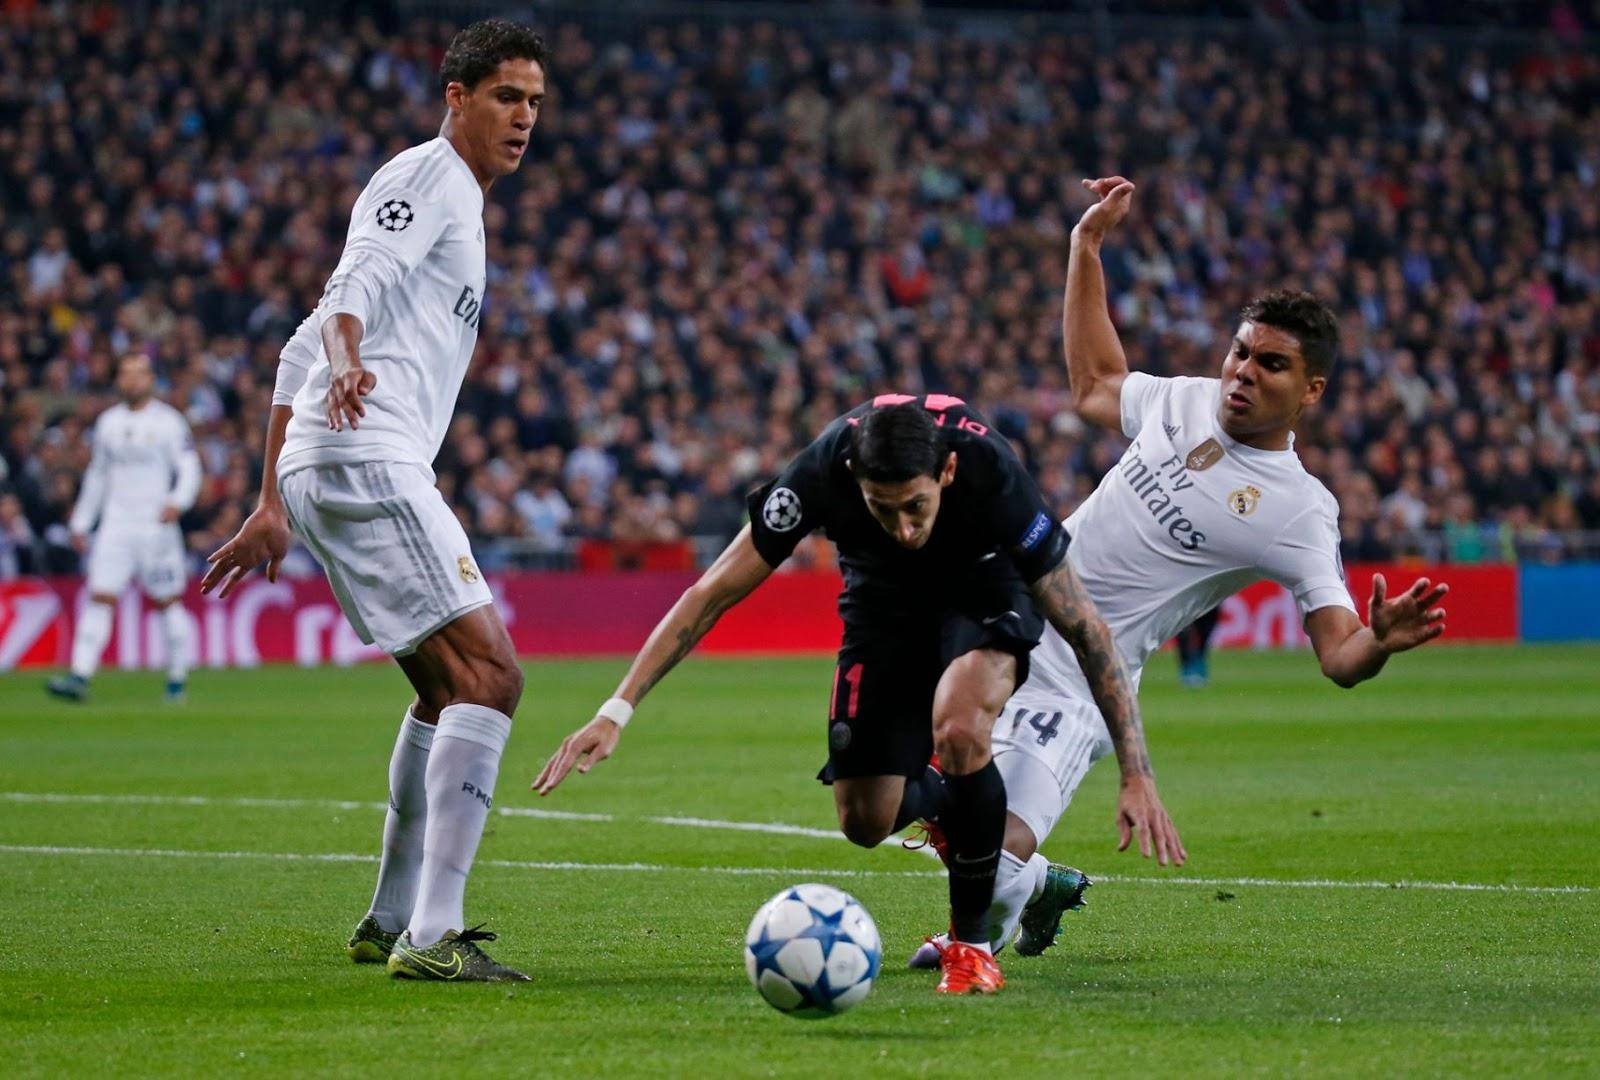 Prediksi Champions League Real Madrid Vs PSG 27 November 2019